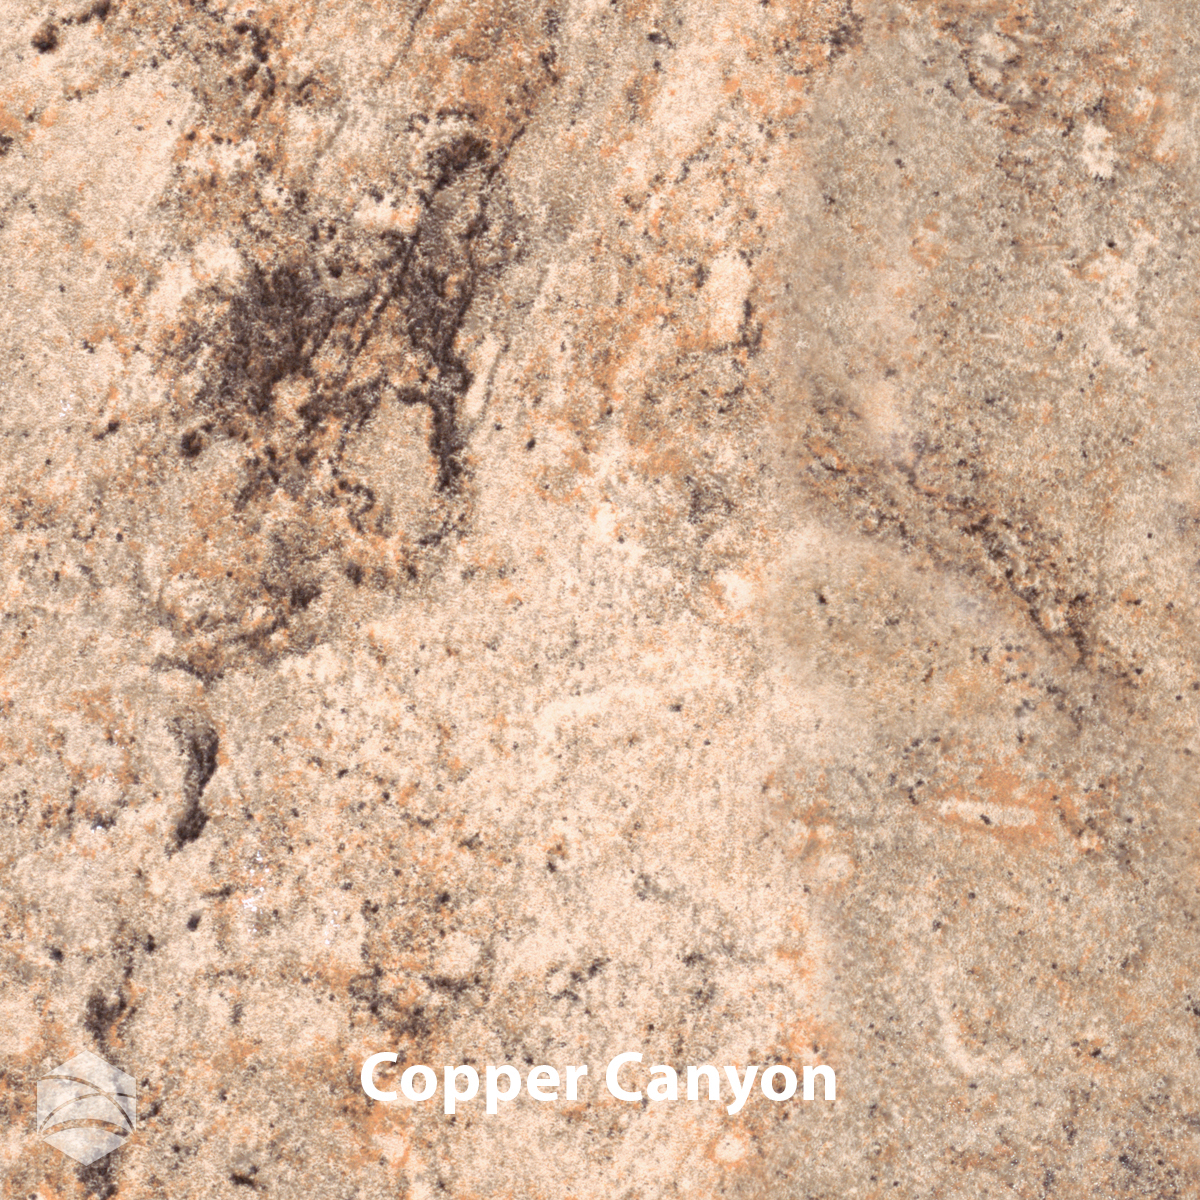 Copper Canyon_V2_12x12.jpg